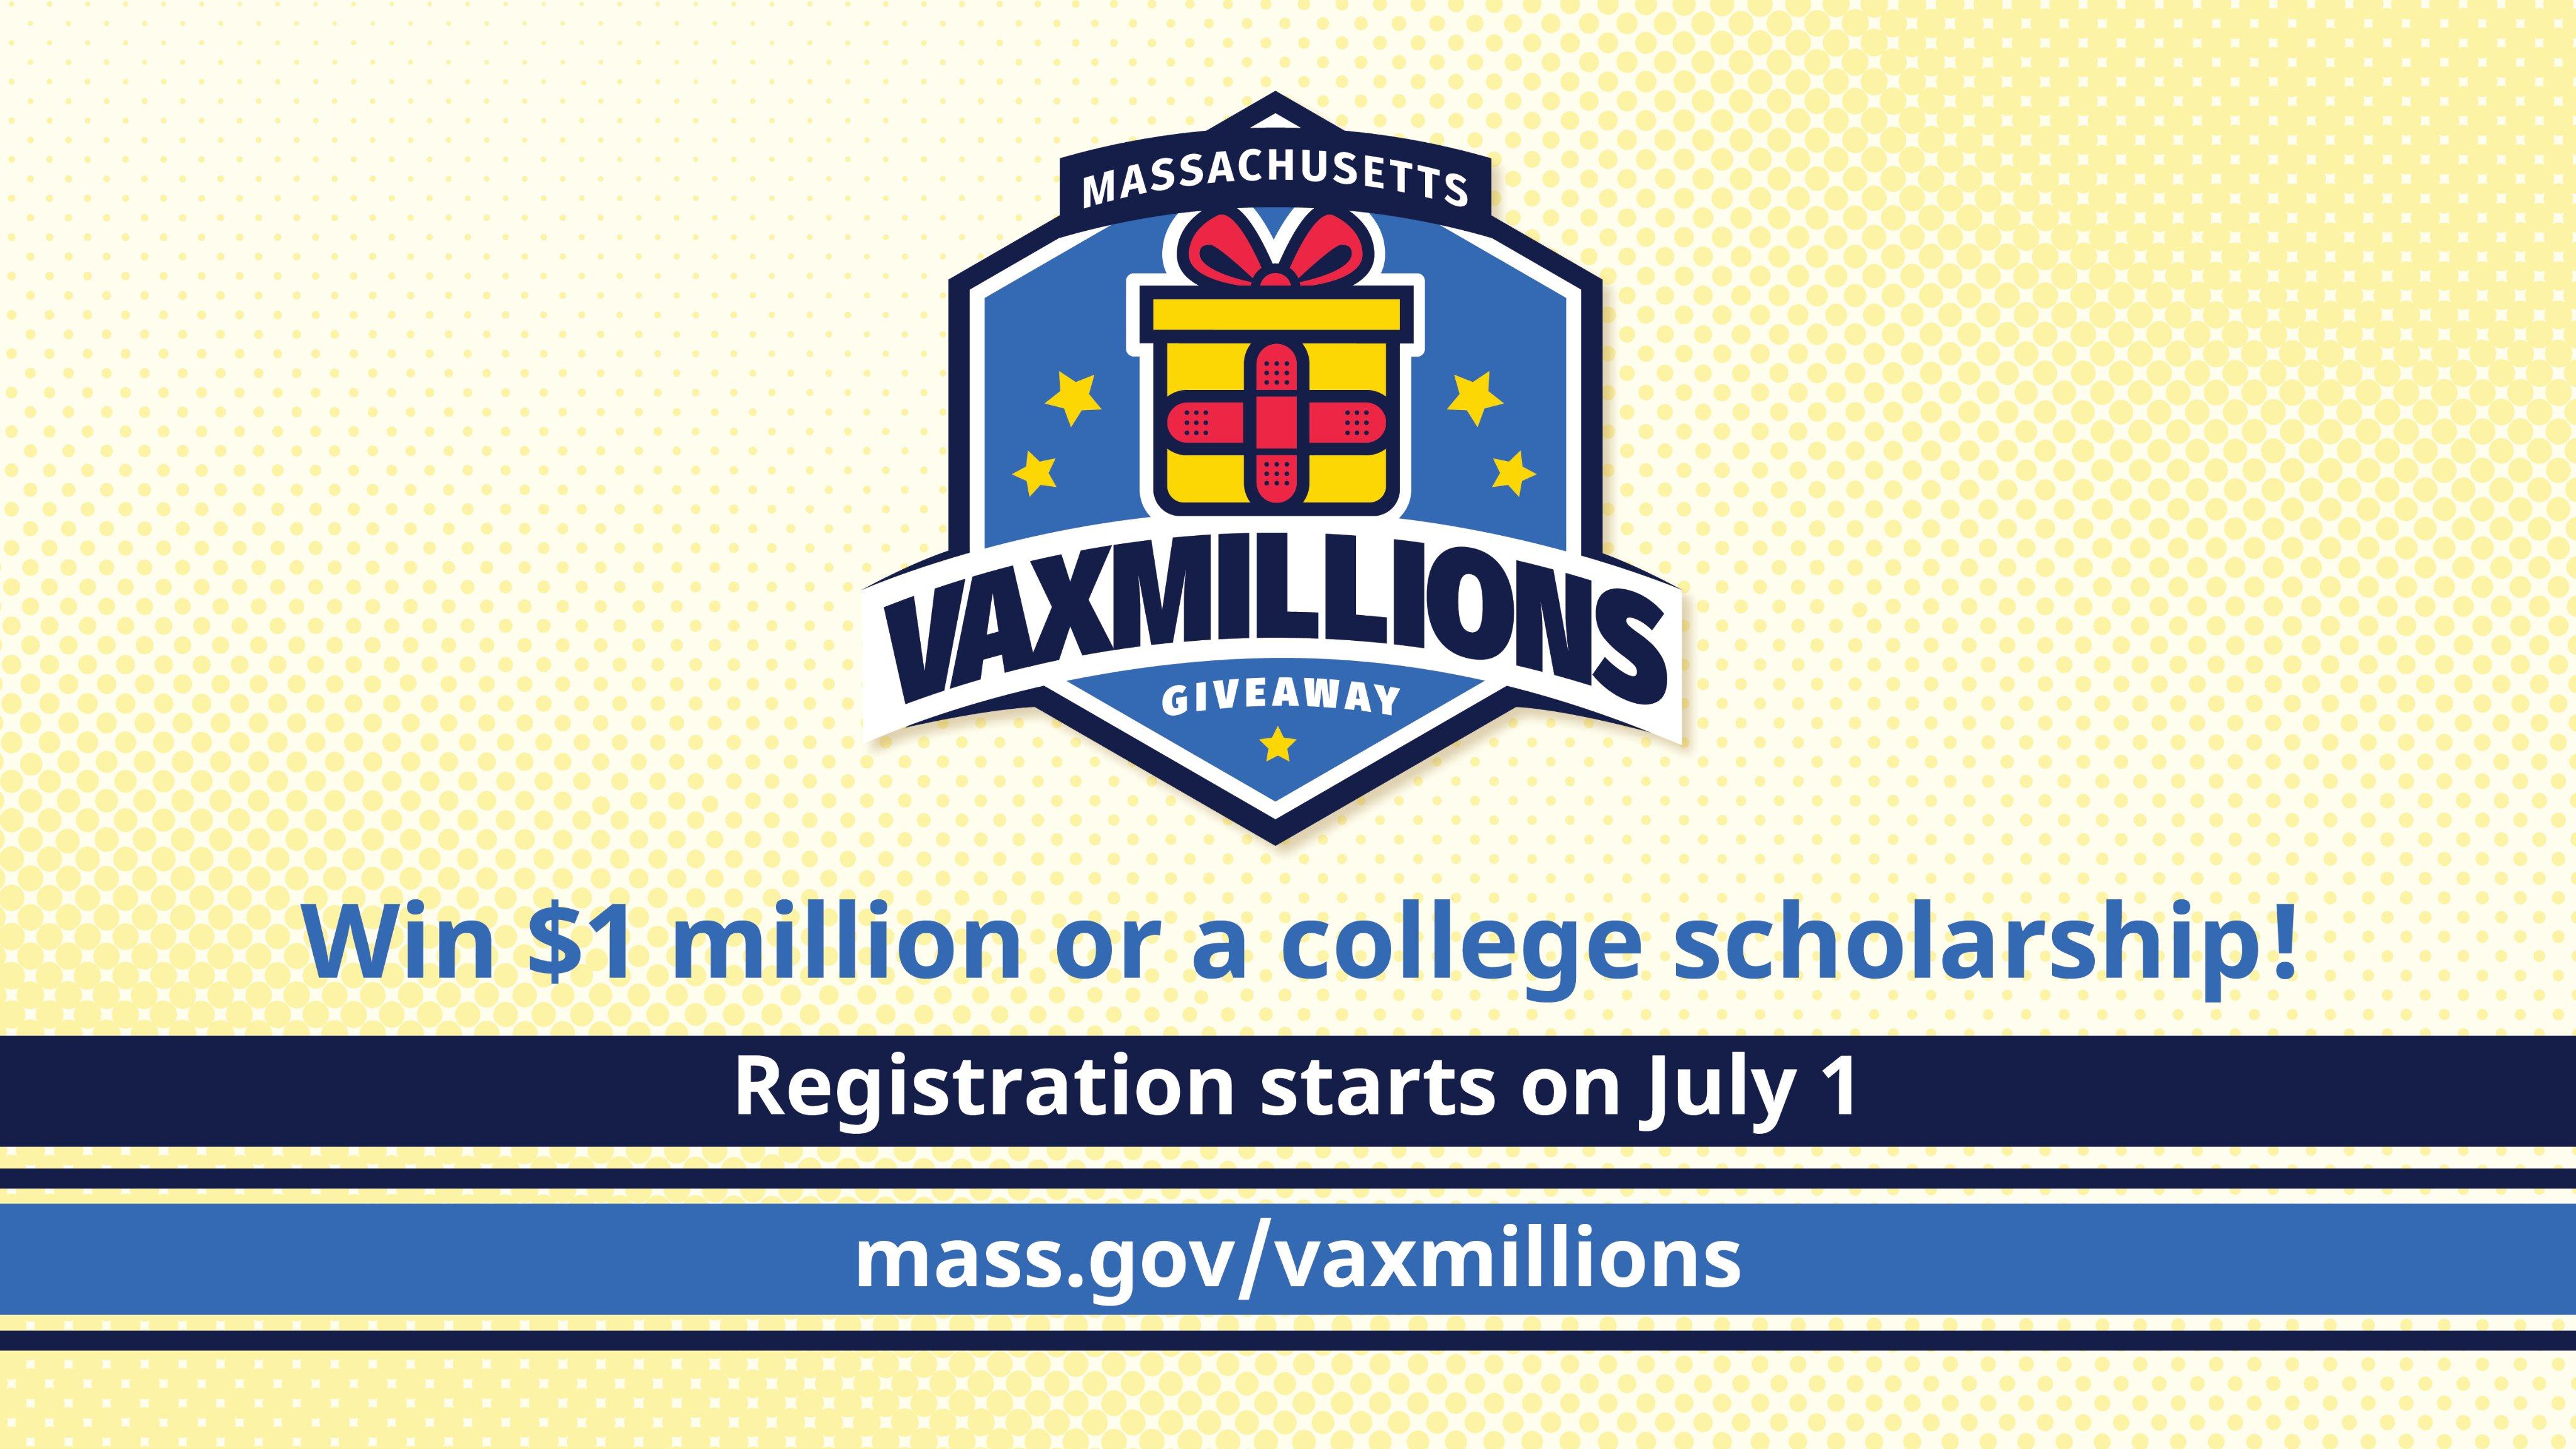 VaxMillions Giveaway registration is open